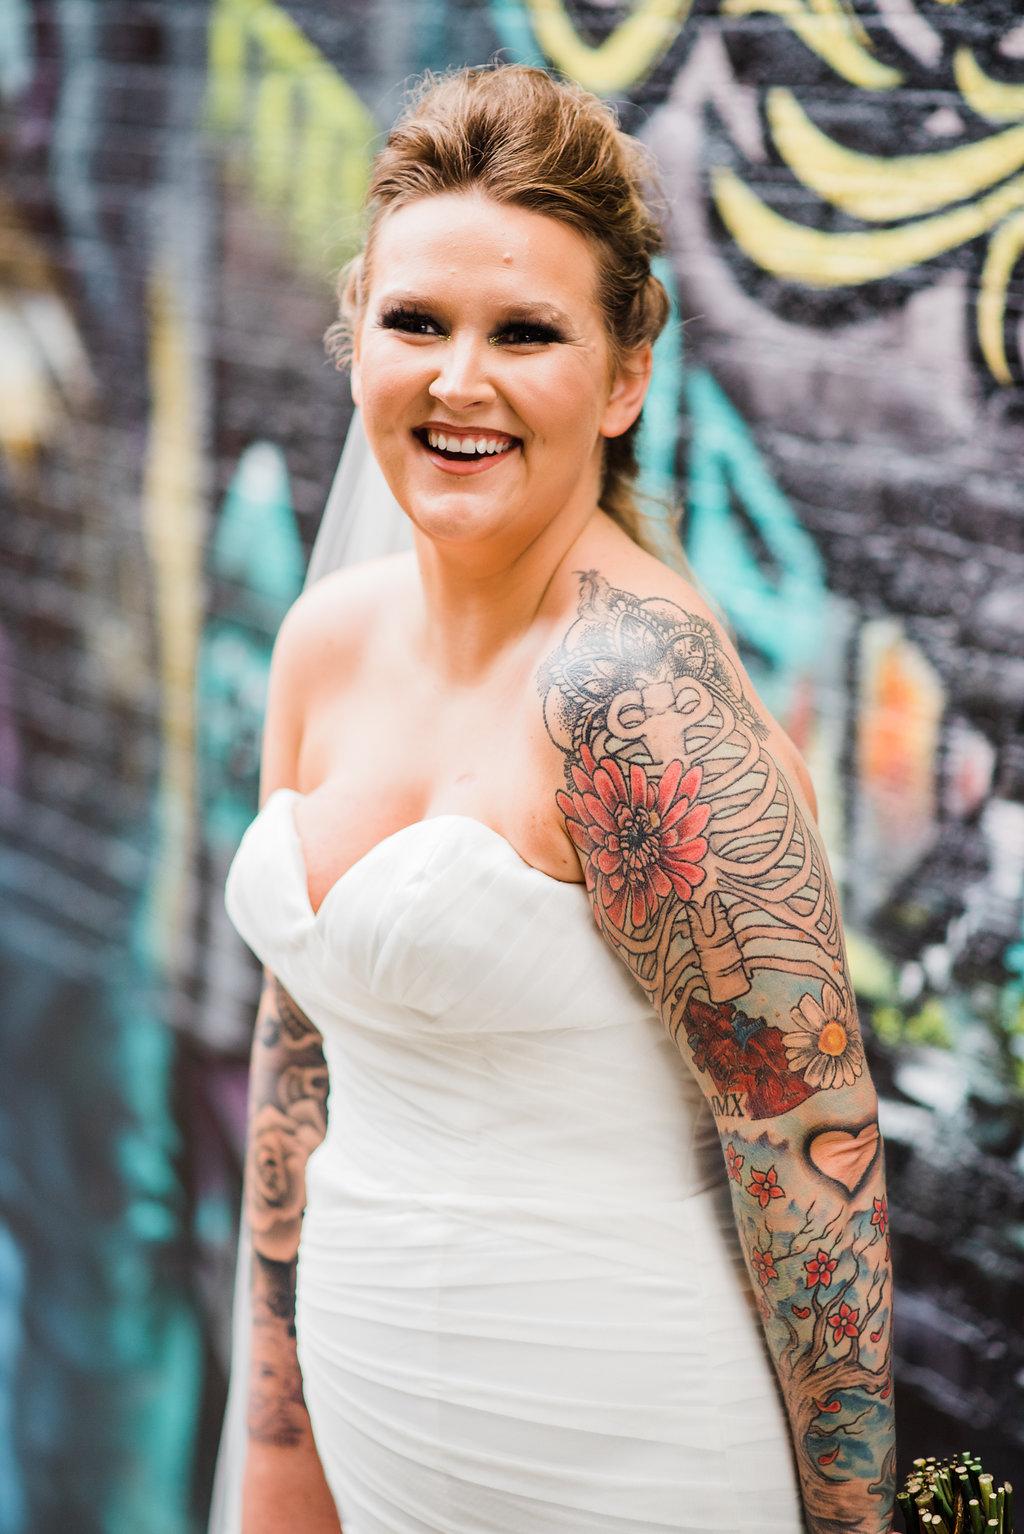 Milwaukee-Wisconsin-Wedding-Photographer-Black-Cat-Alley-Styled-Bridal-Shoot-61.jpg